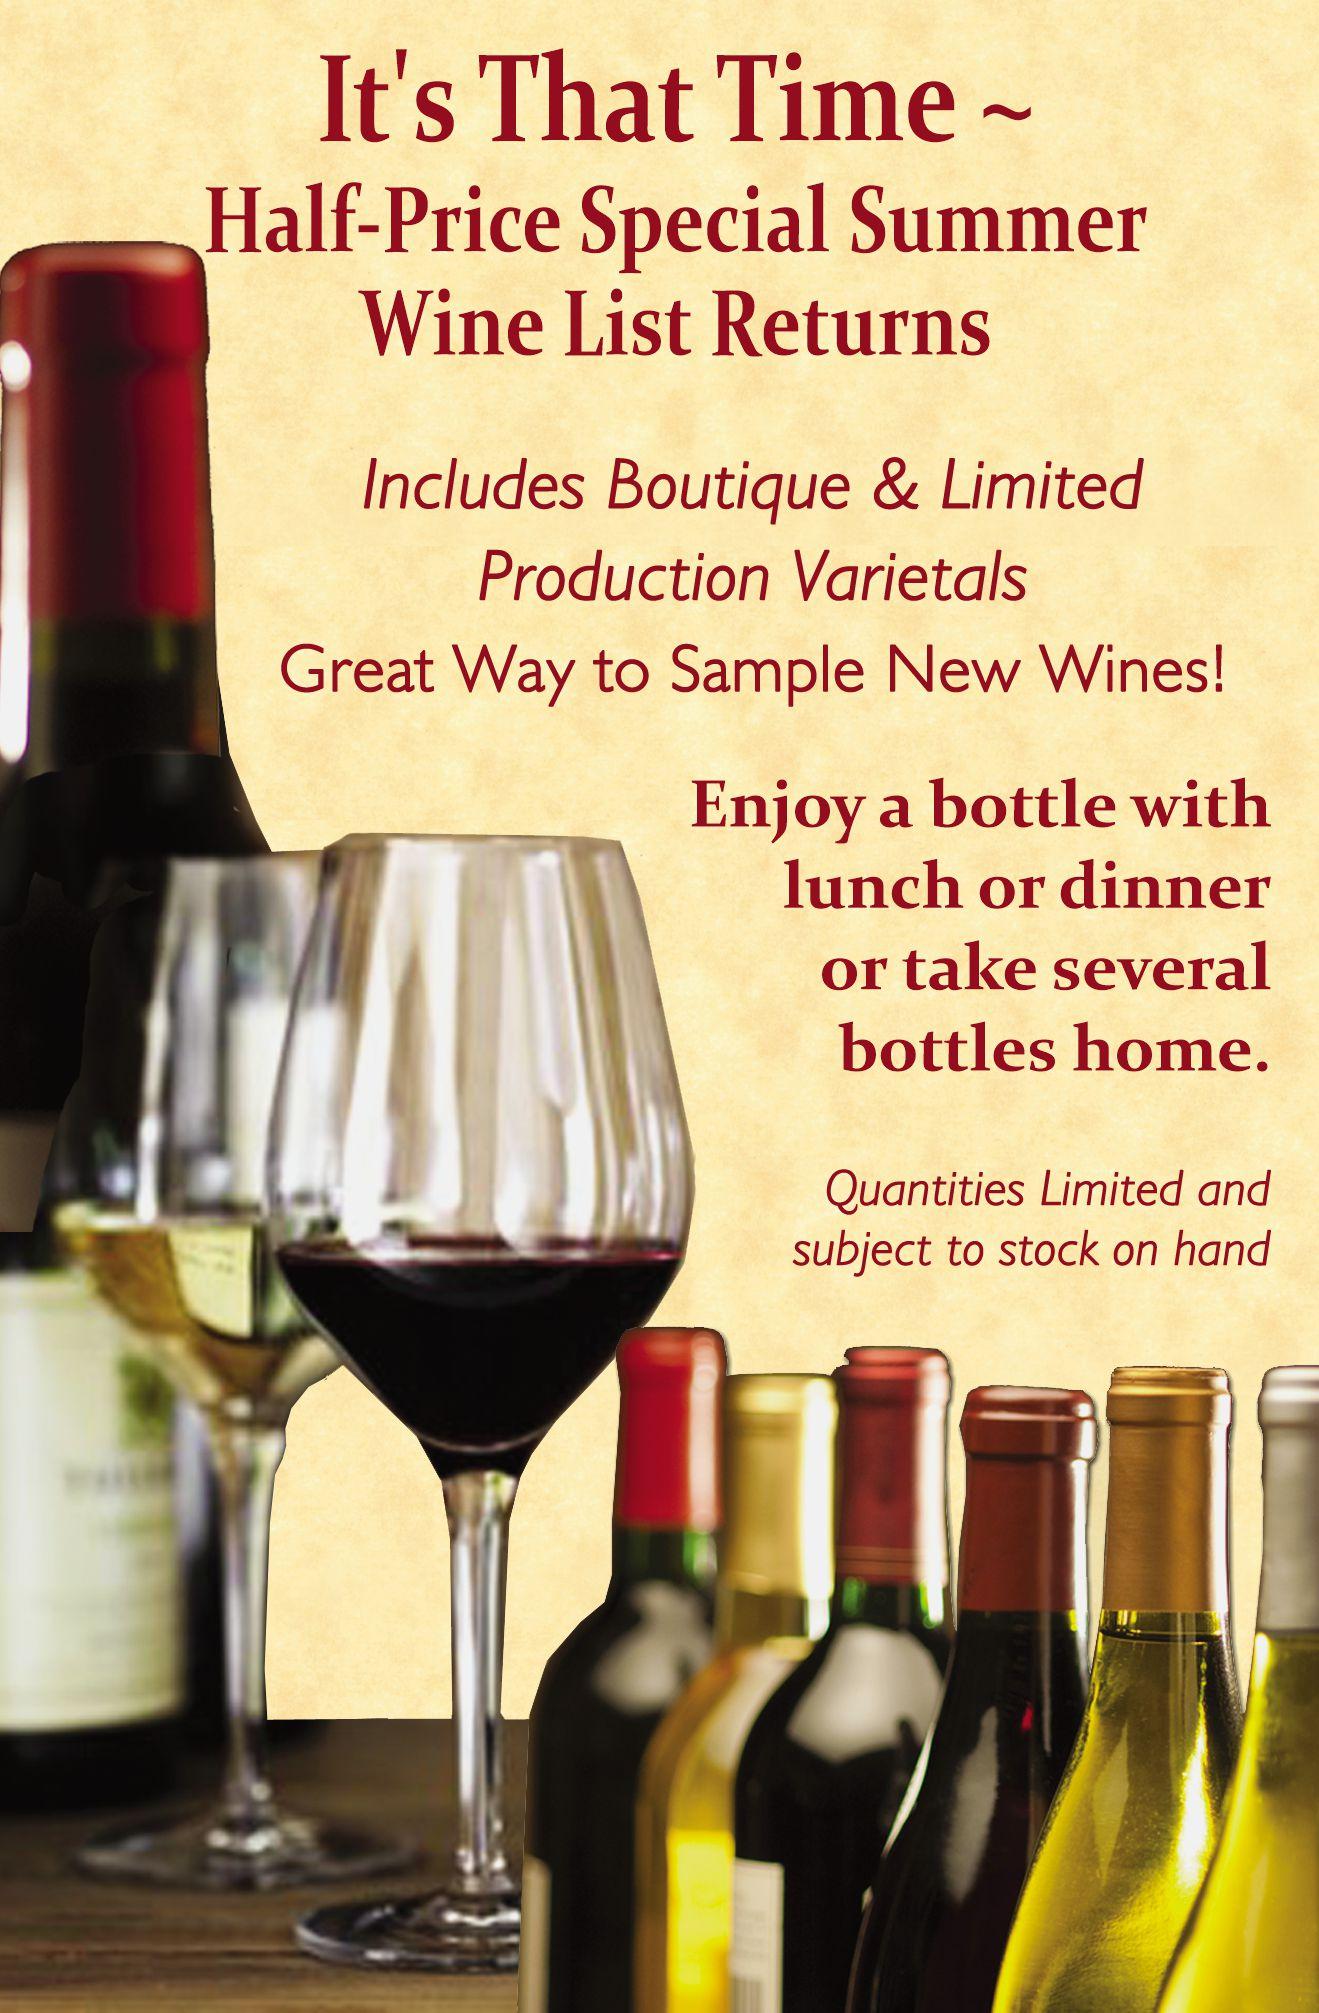 Half-Price Summer Wines